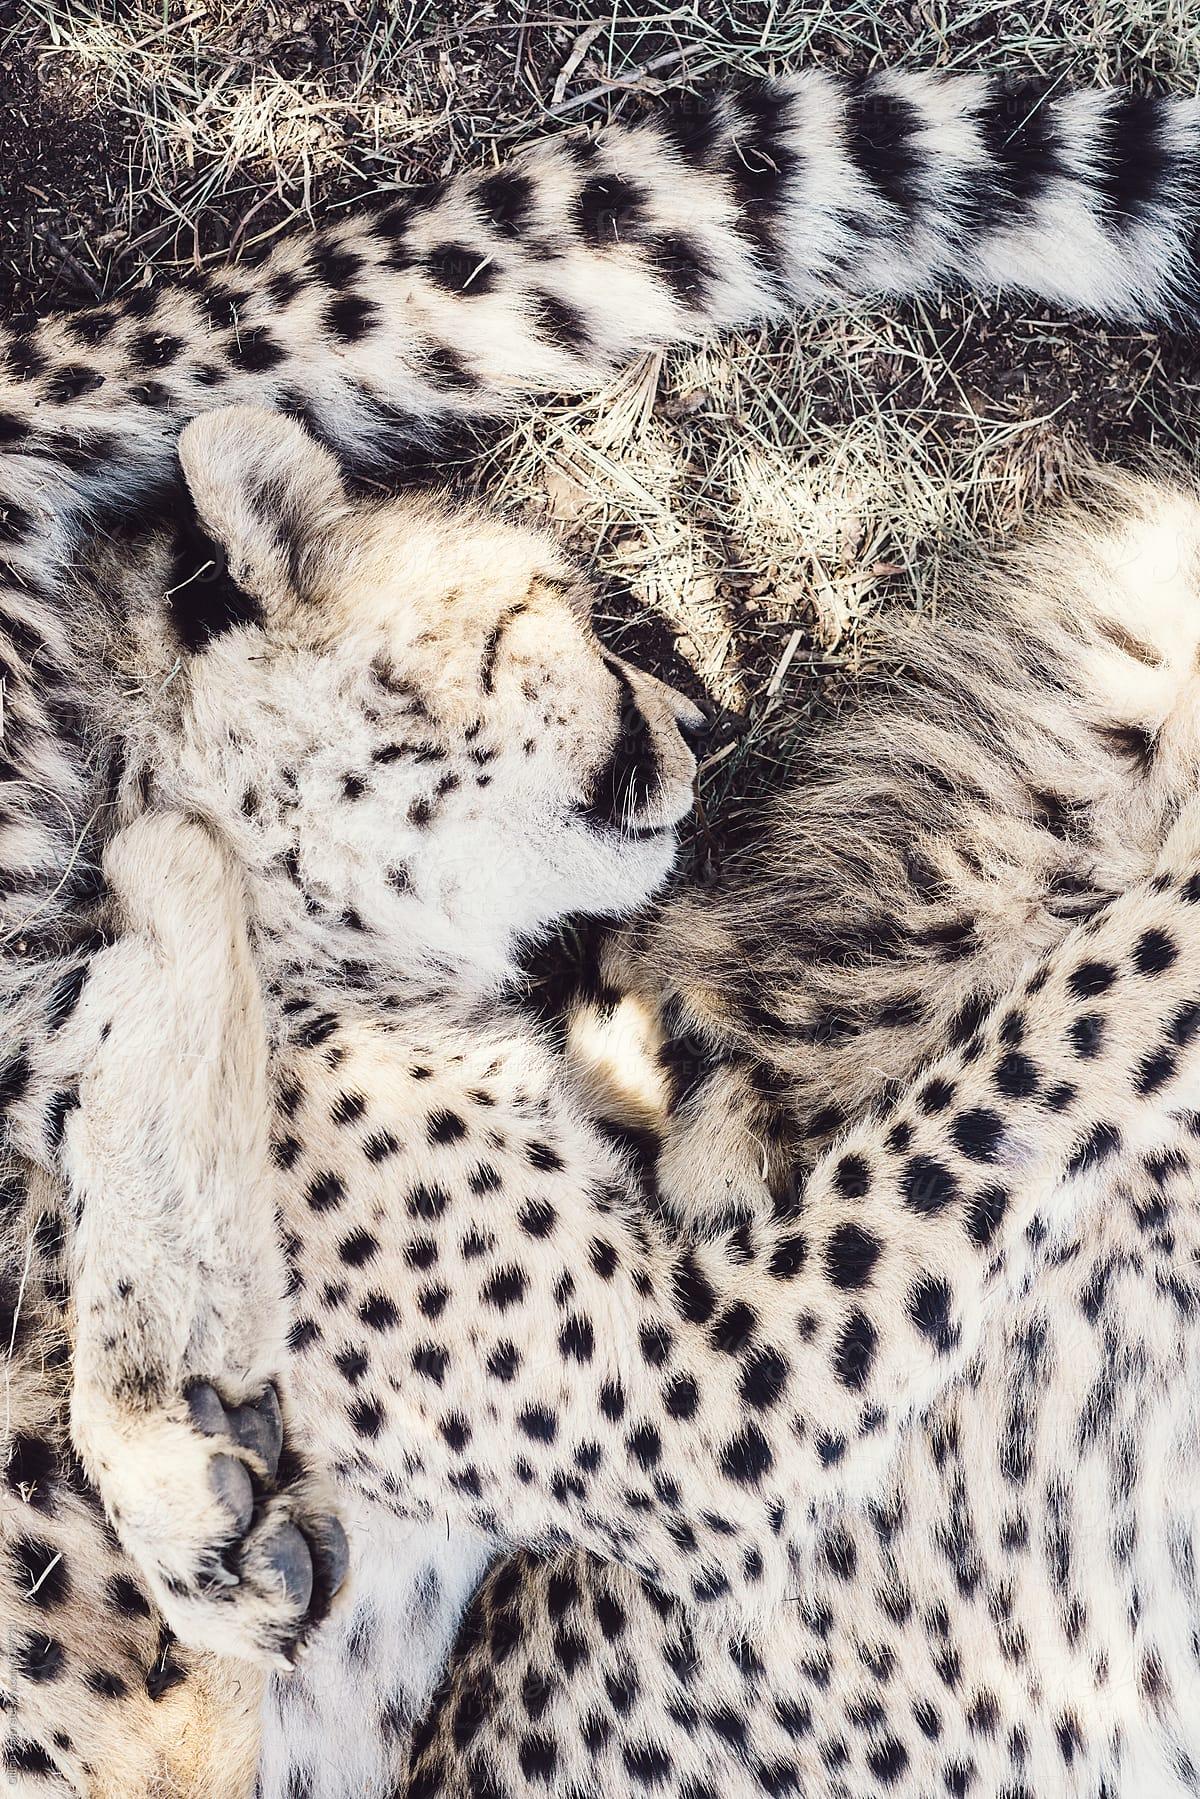 cheetah cubs sleeping stocksy united